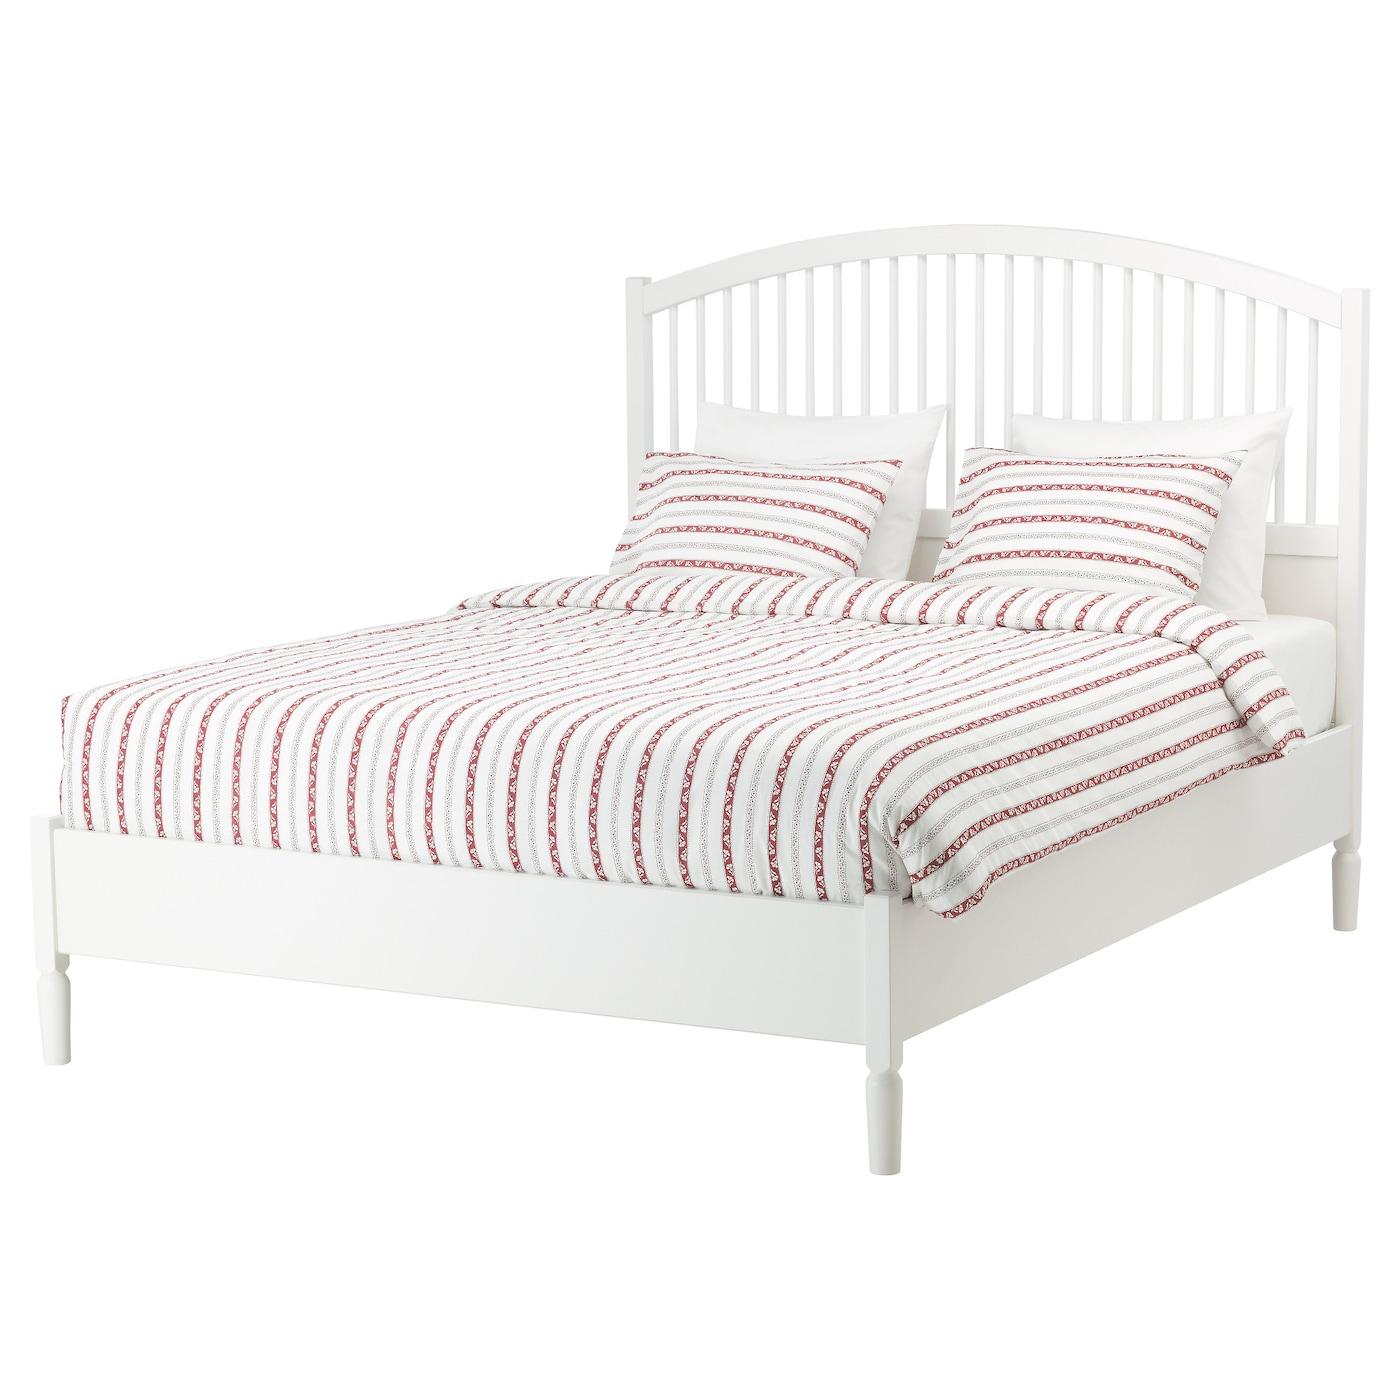 TYSSEDAL Bed frame White/lönset Standard King - IKEA